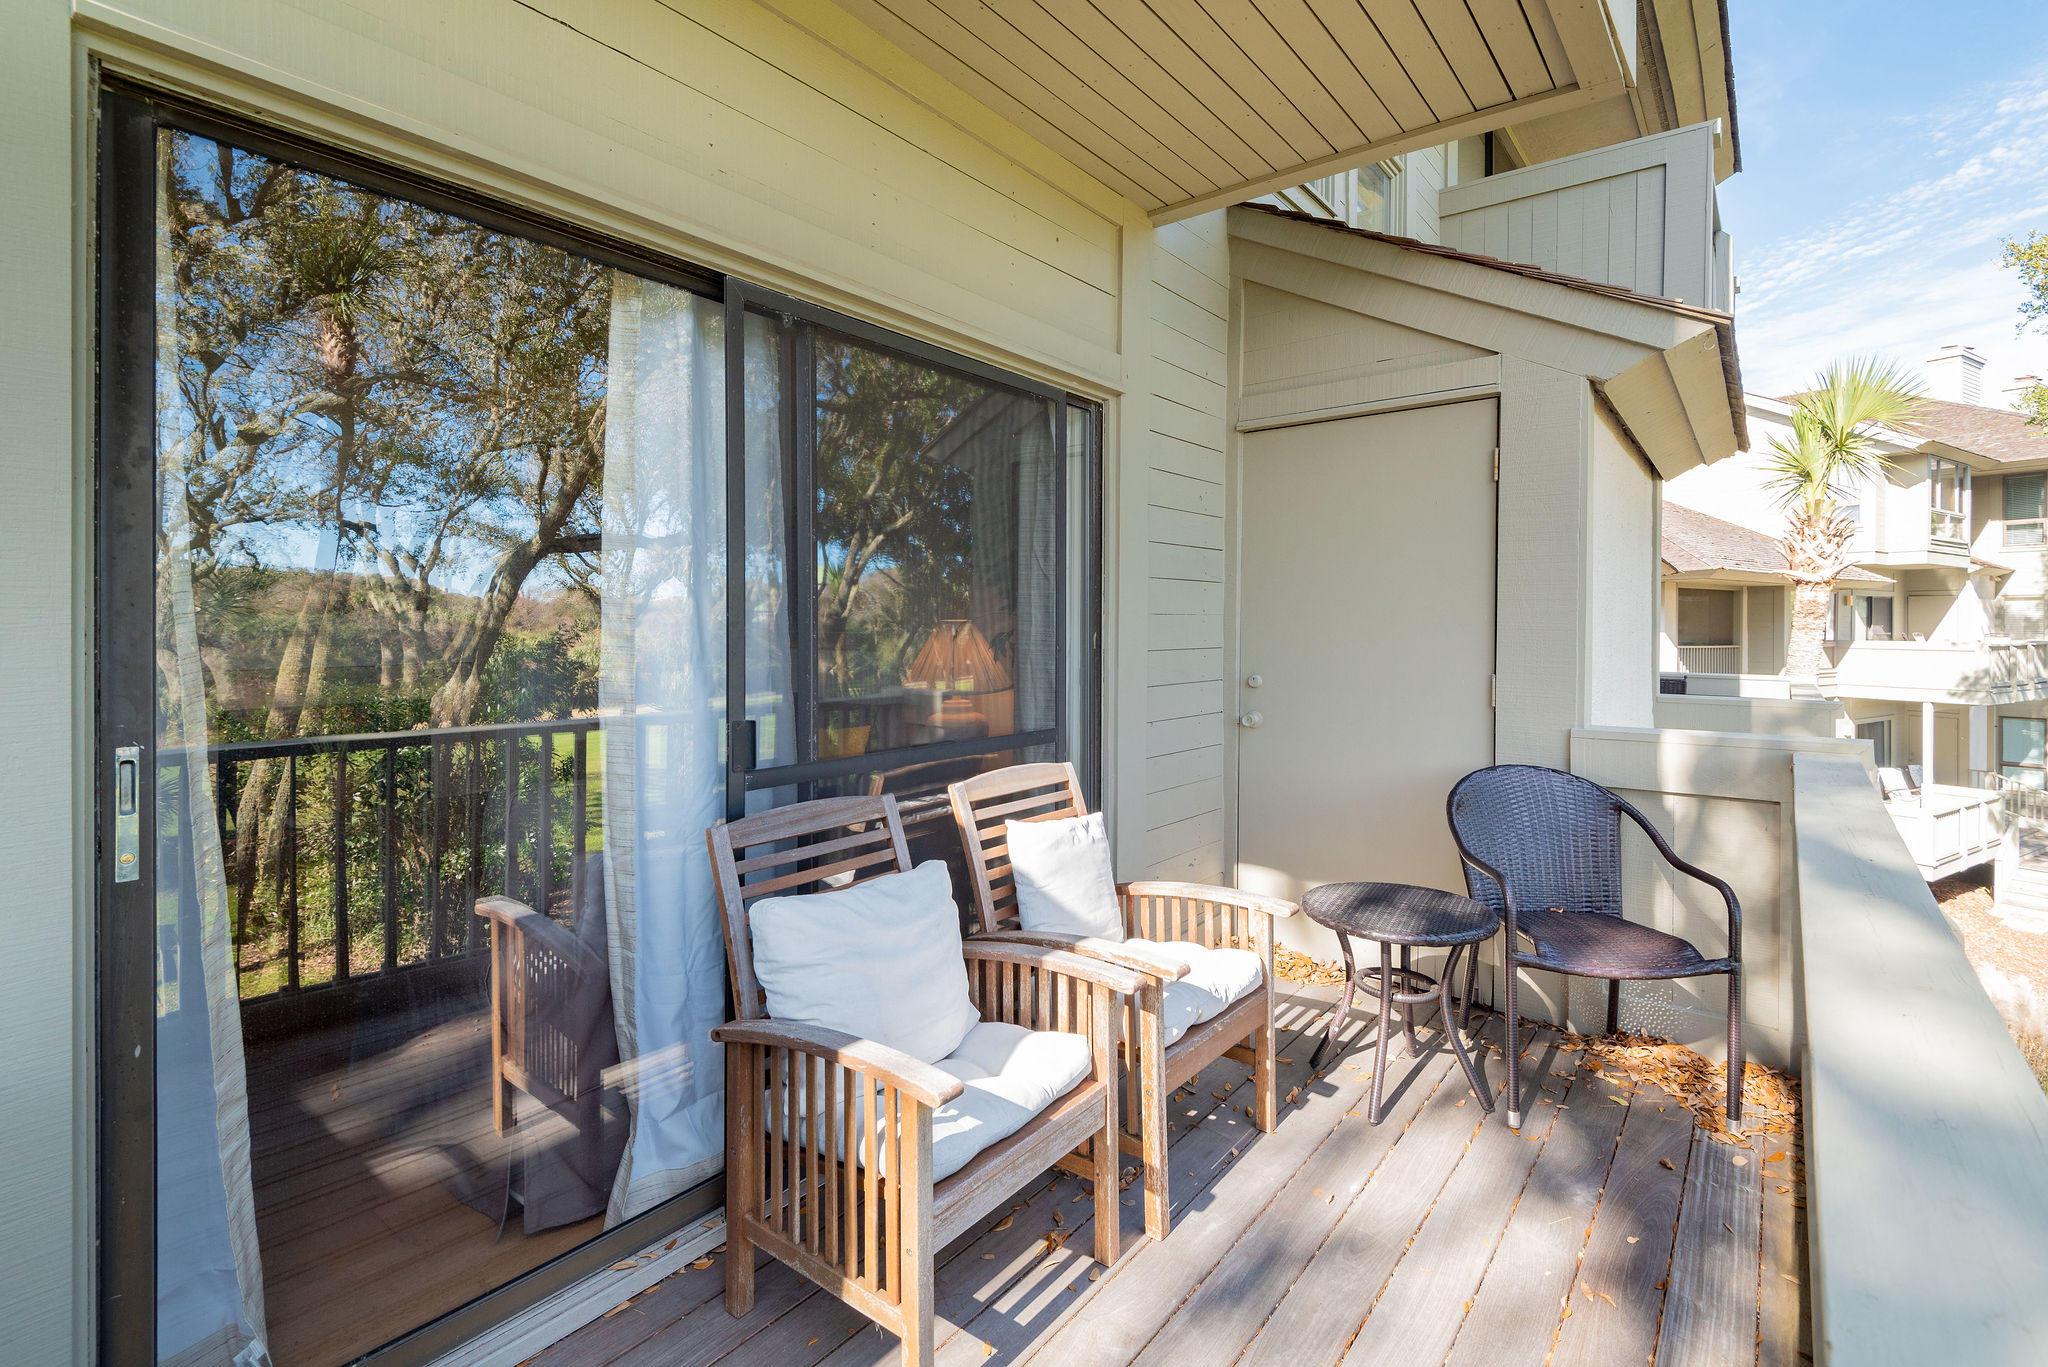 Kiawah Island Homes For Sale - 5004 Green Dolphin, Kiawah Island, SC - 23